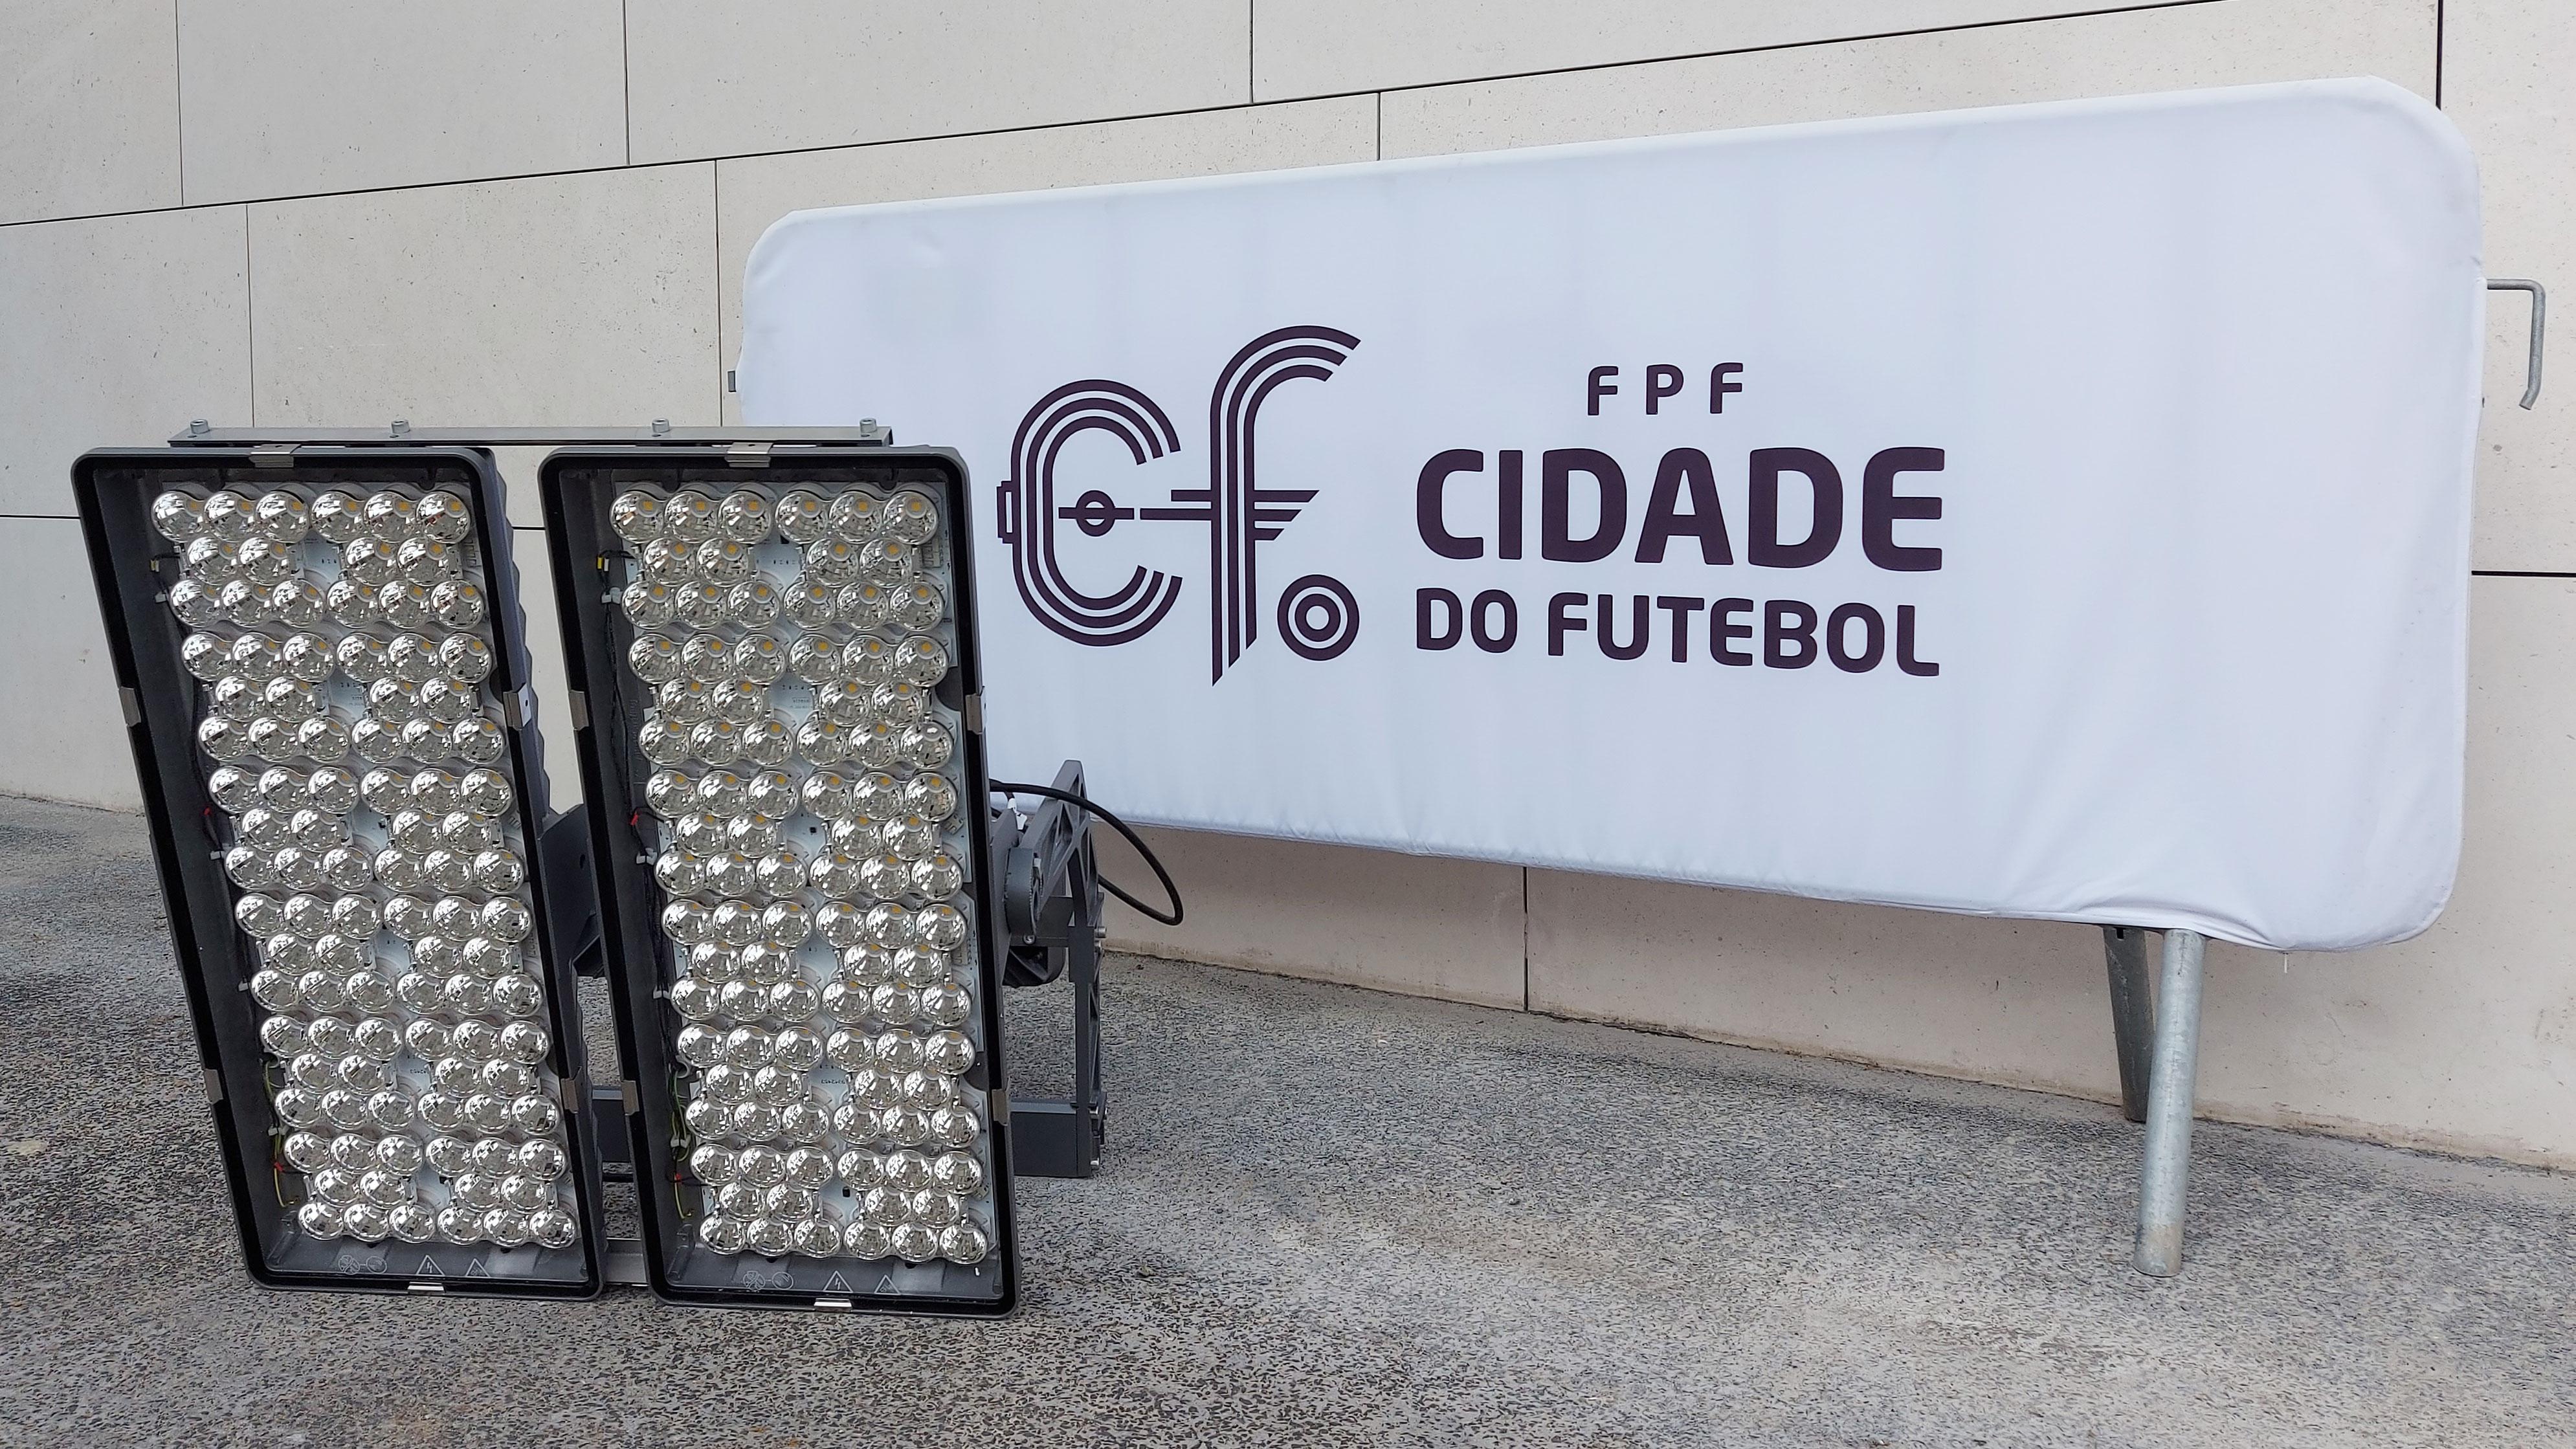 dael_industria_metalurgica_lda-DAEL na Cidade do Futebol